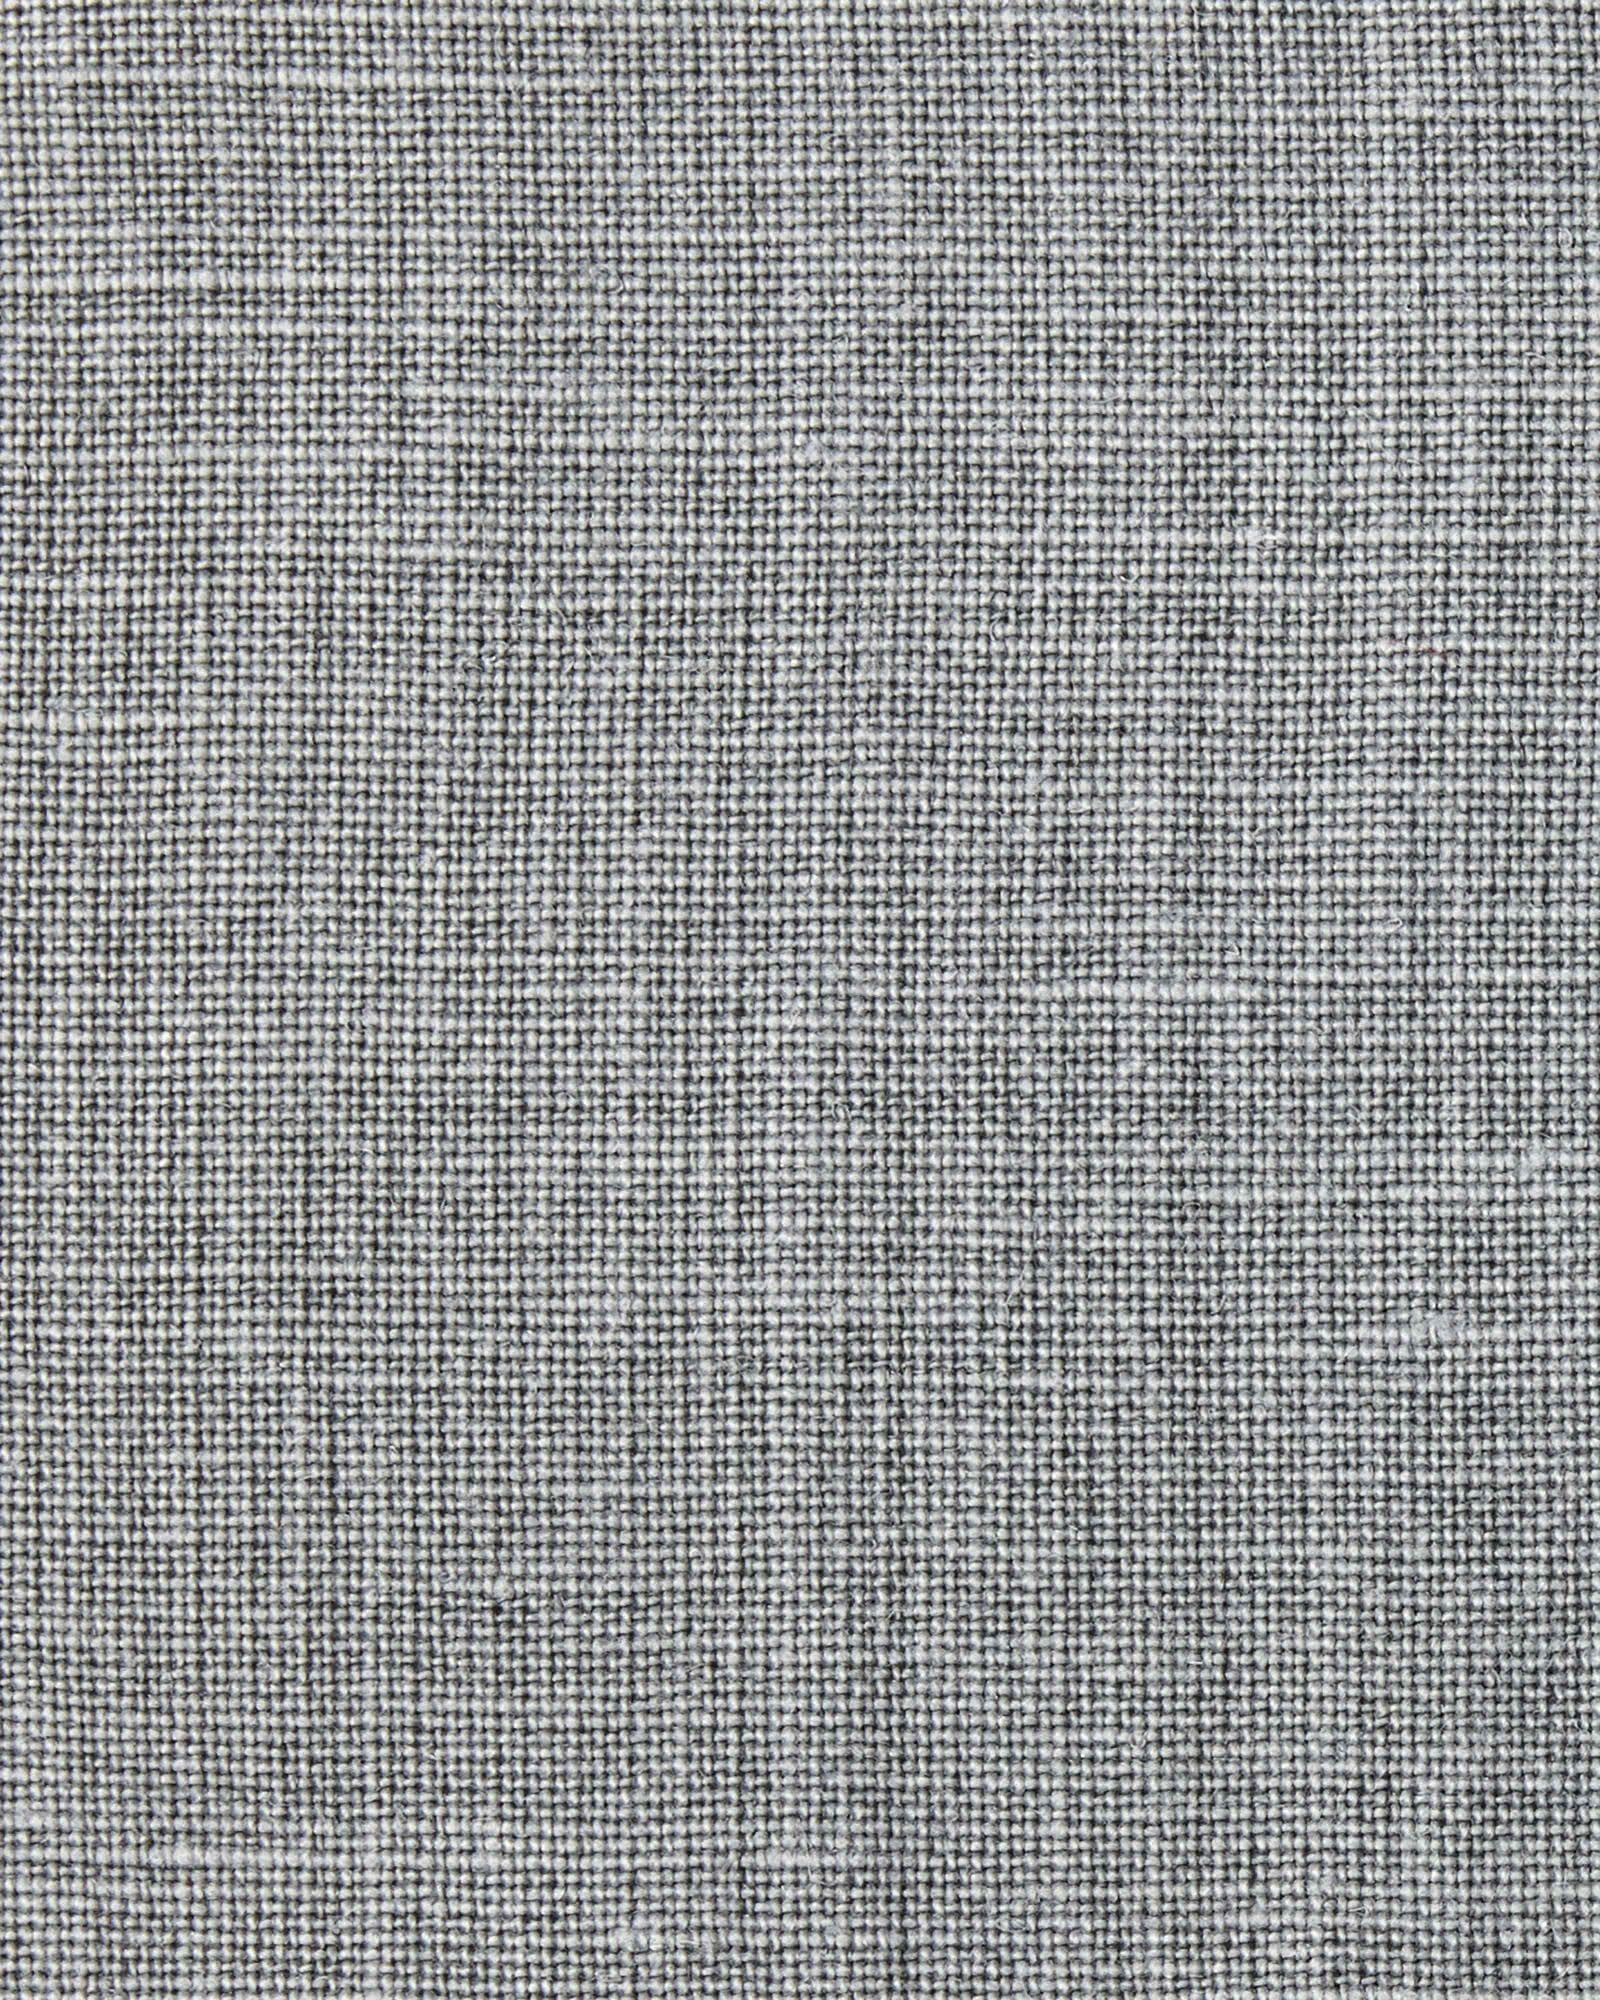 Washed Linen Linen Fabric Washed Linen Fabric Textures